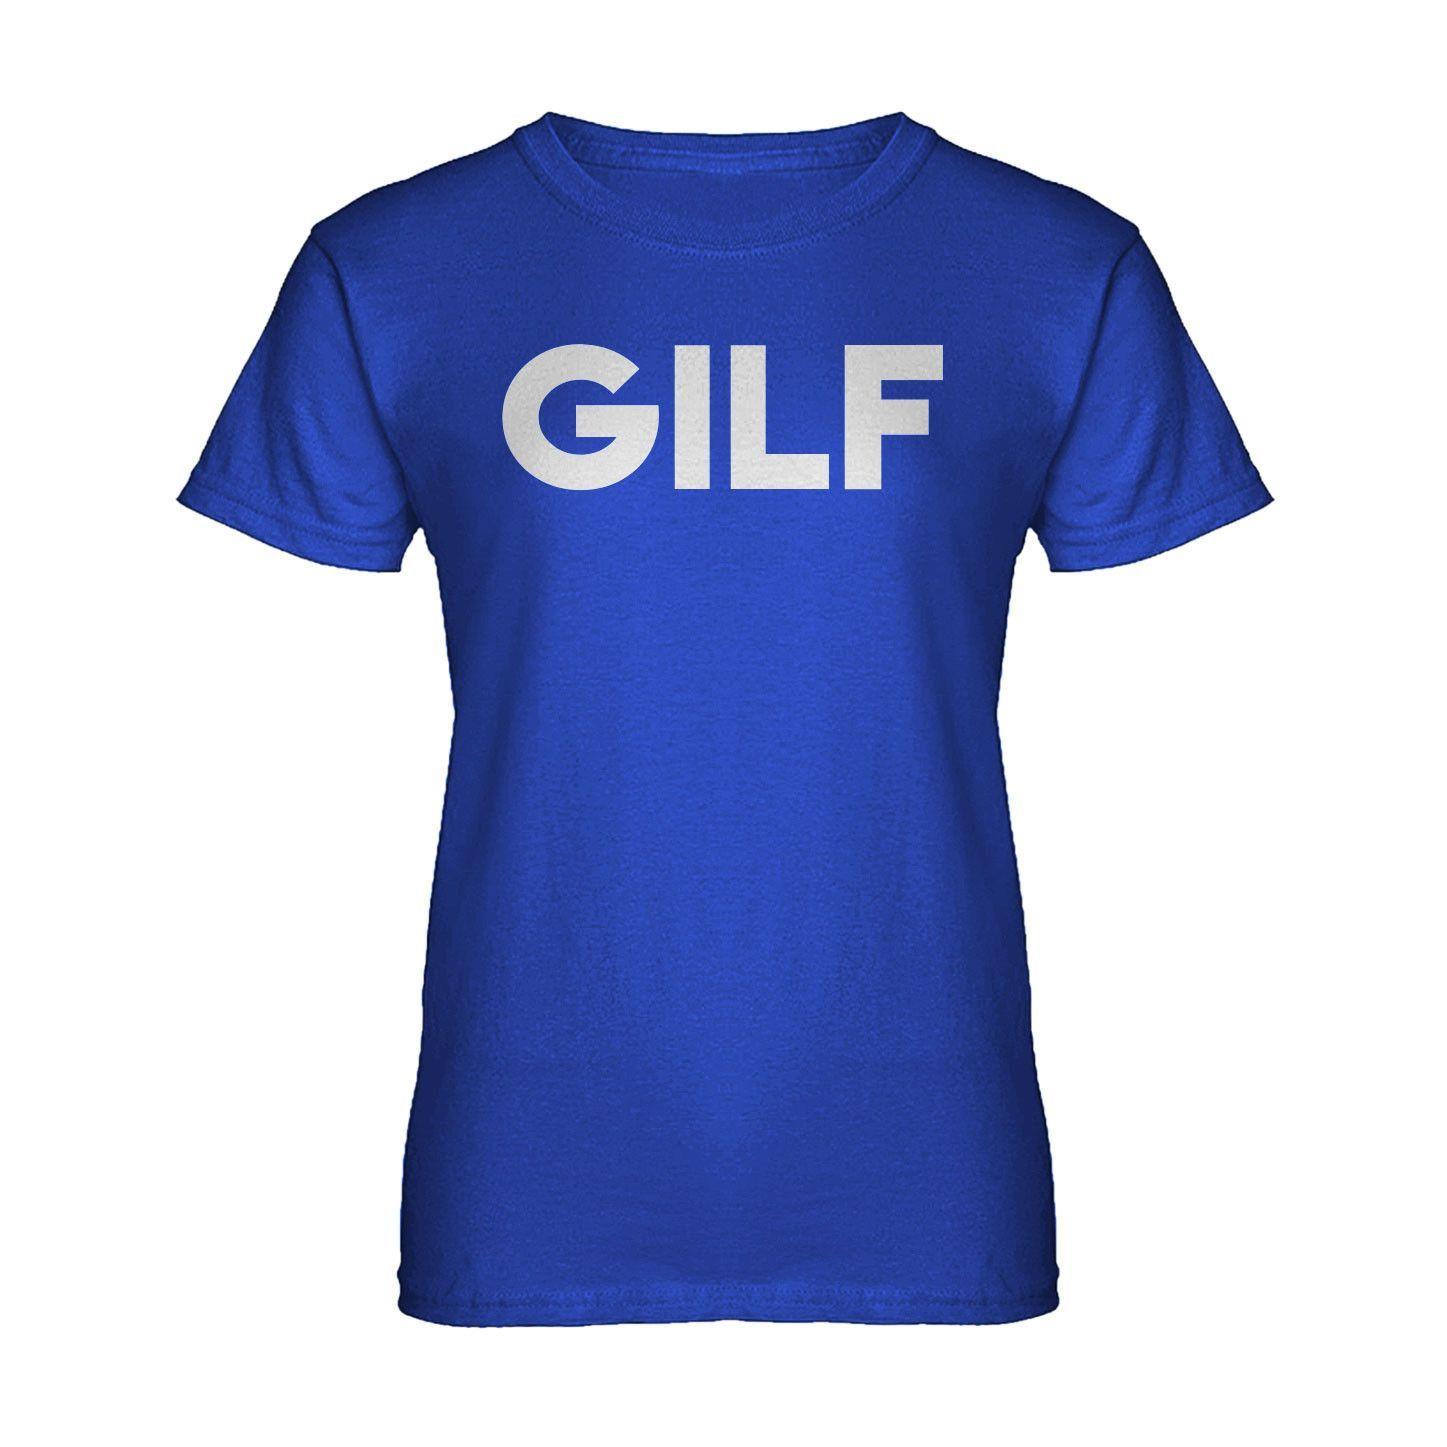 GILF Womens T-shirt